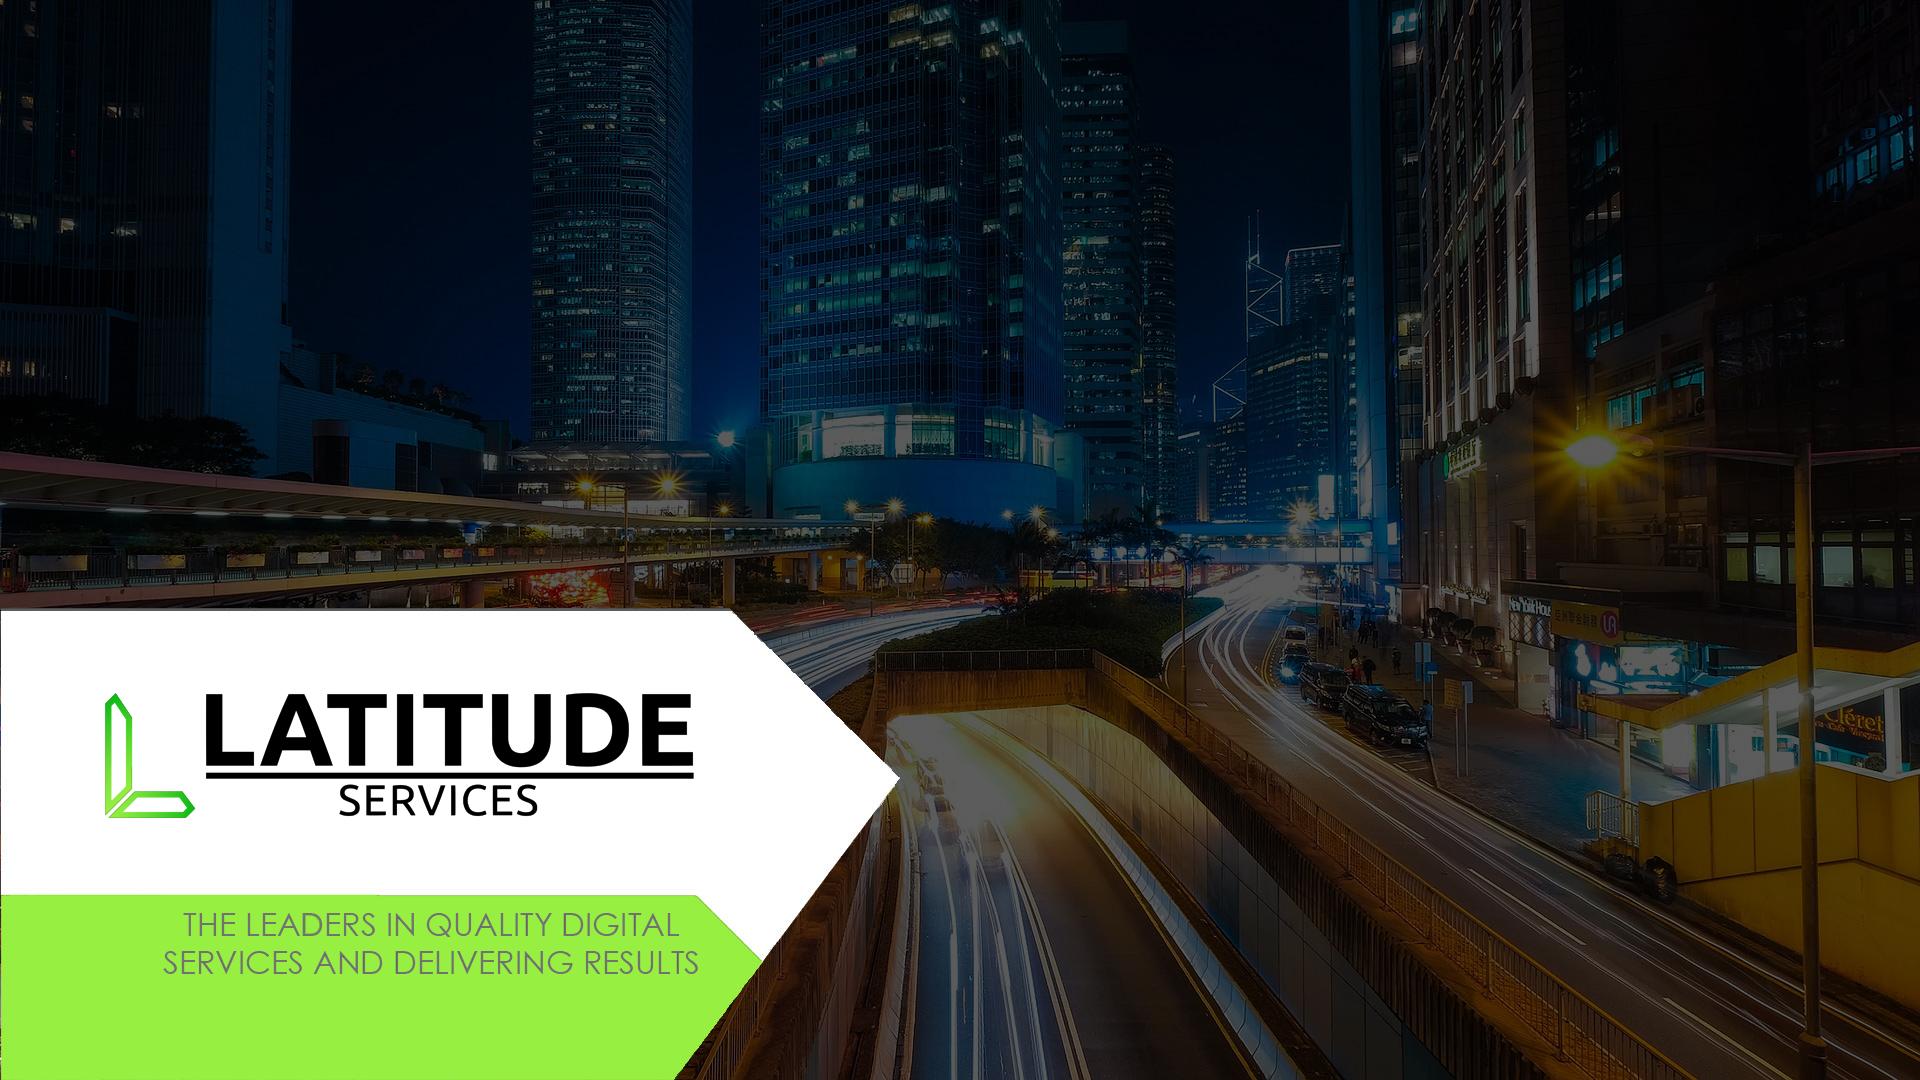 Latitude Services Banner